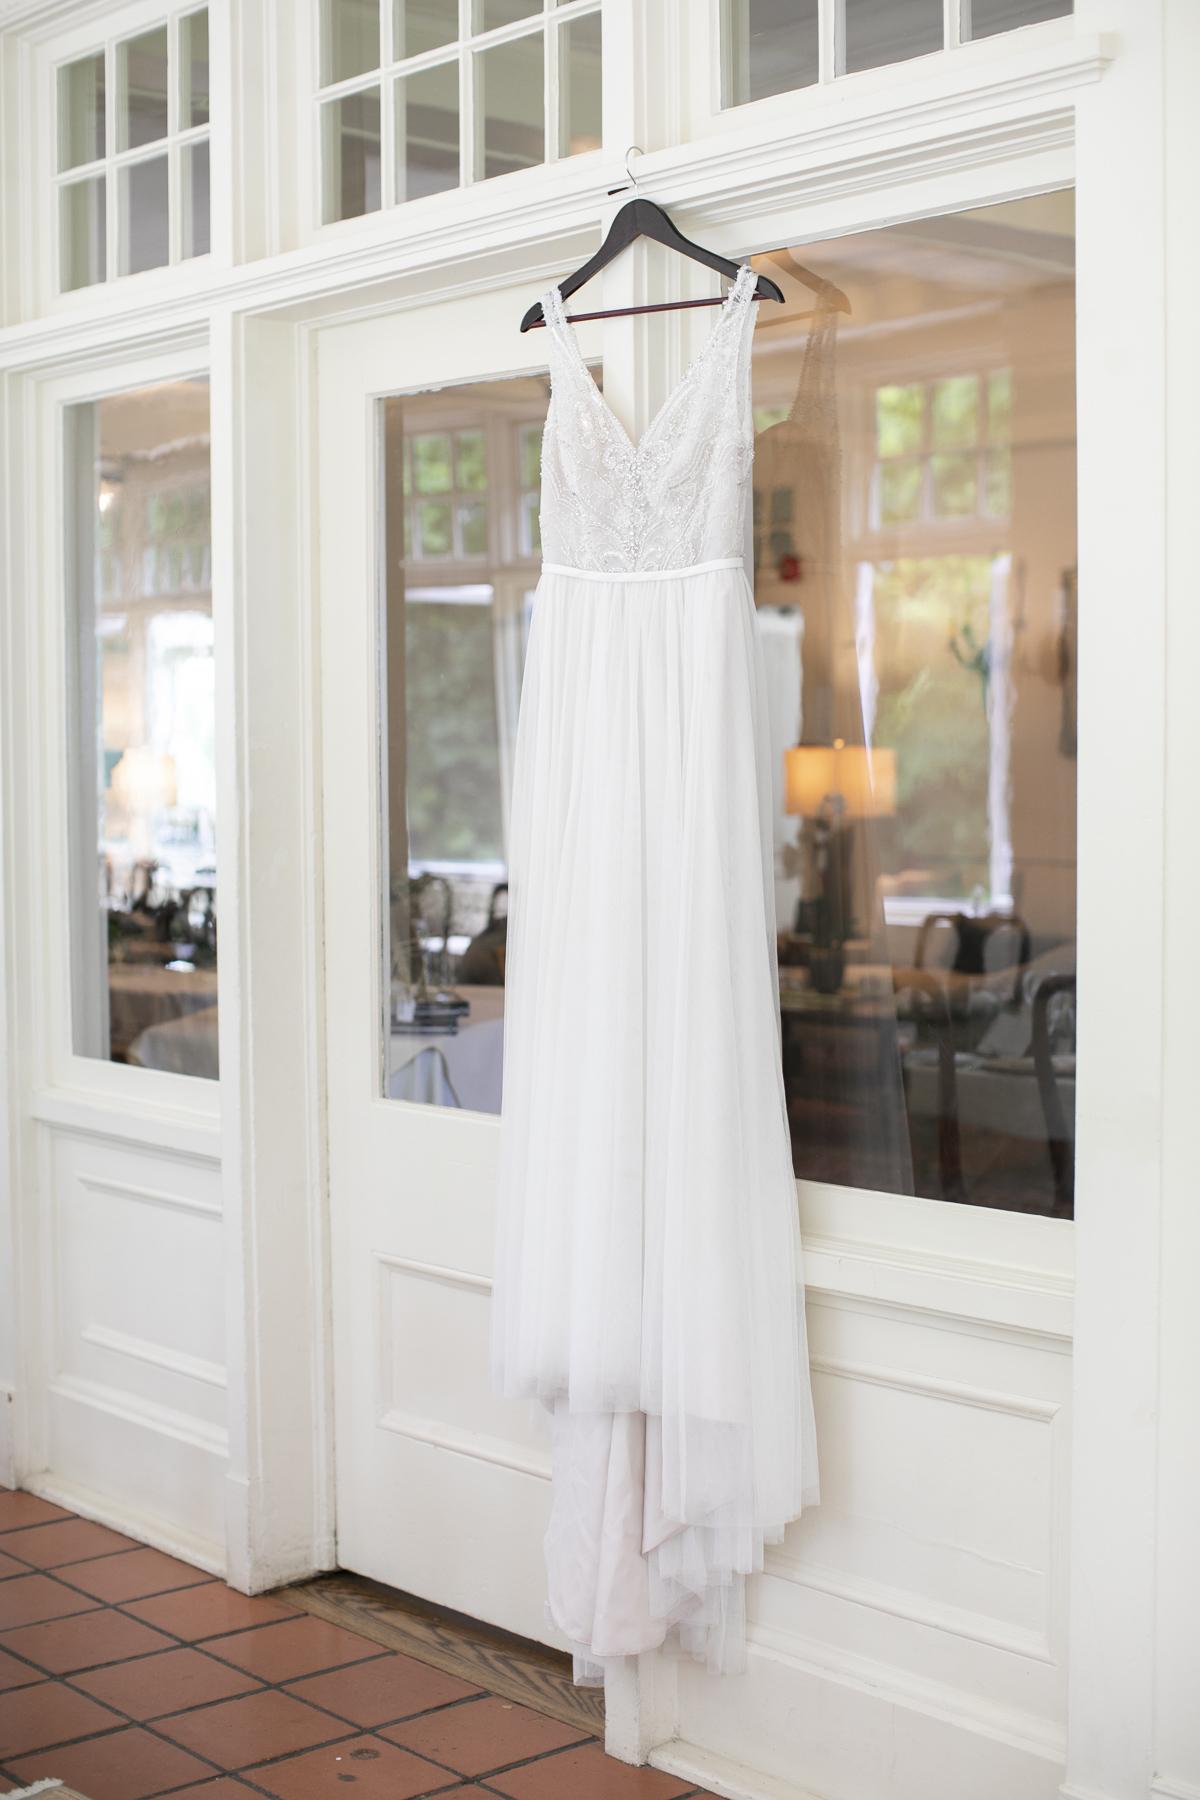 vineyard-bride-philosophy-studios-outdoor-summer-wedding-the-tamahaac-club-niagara-ancaster-toronto-vendor-0015.JPG